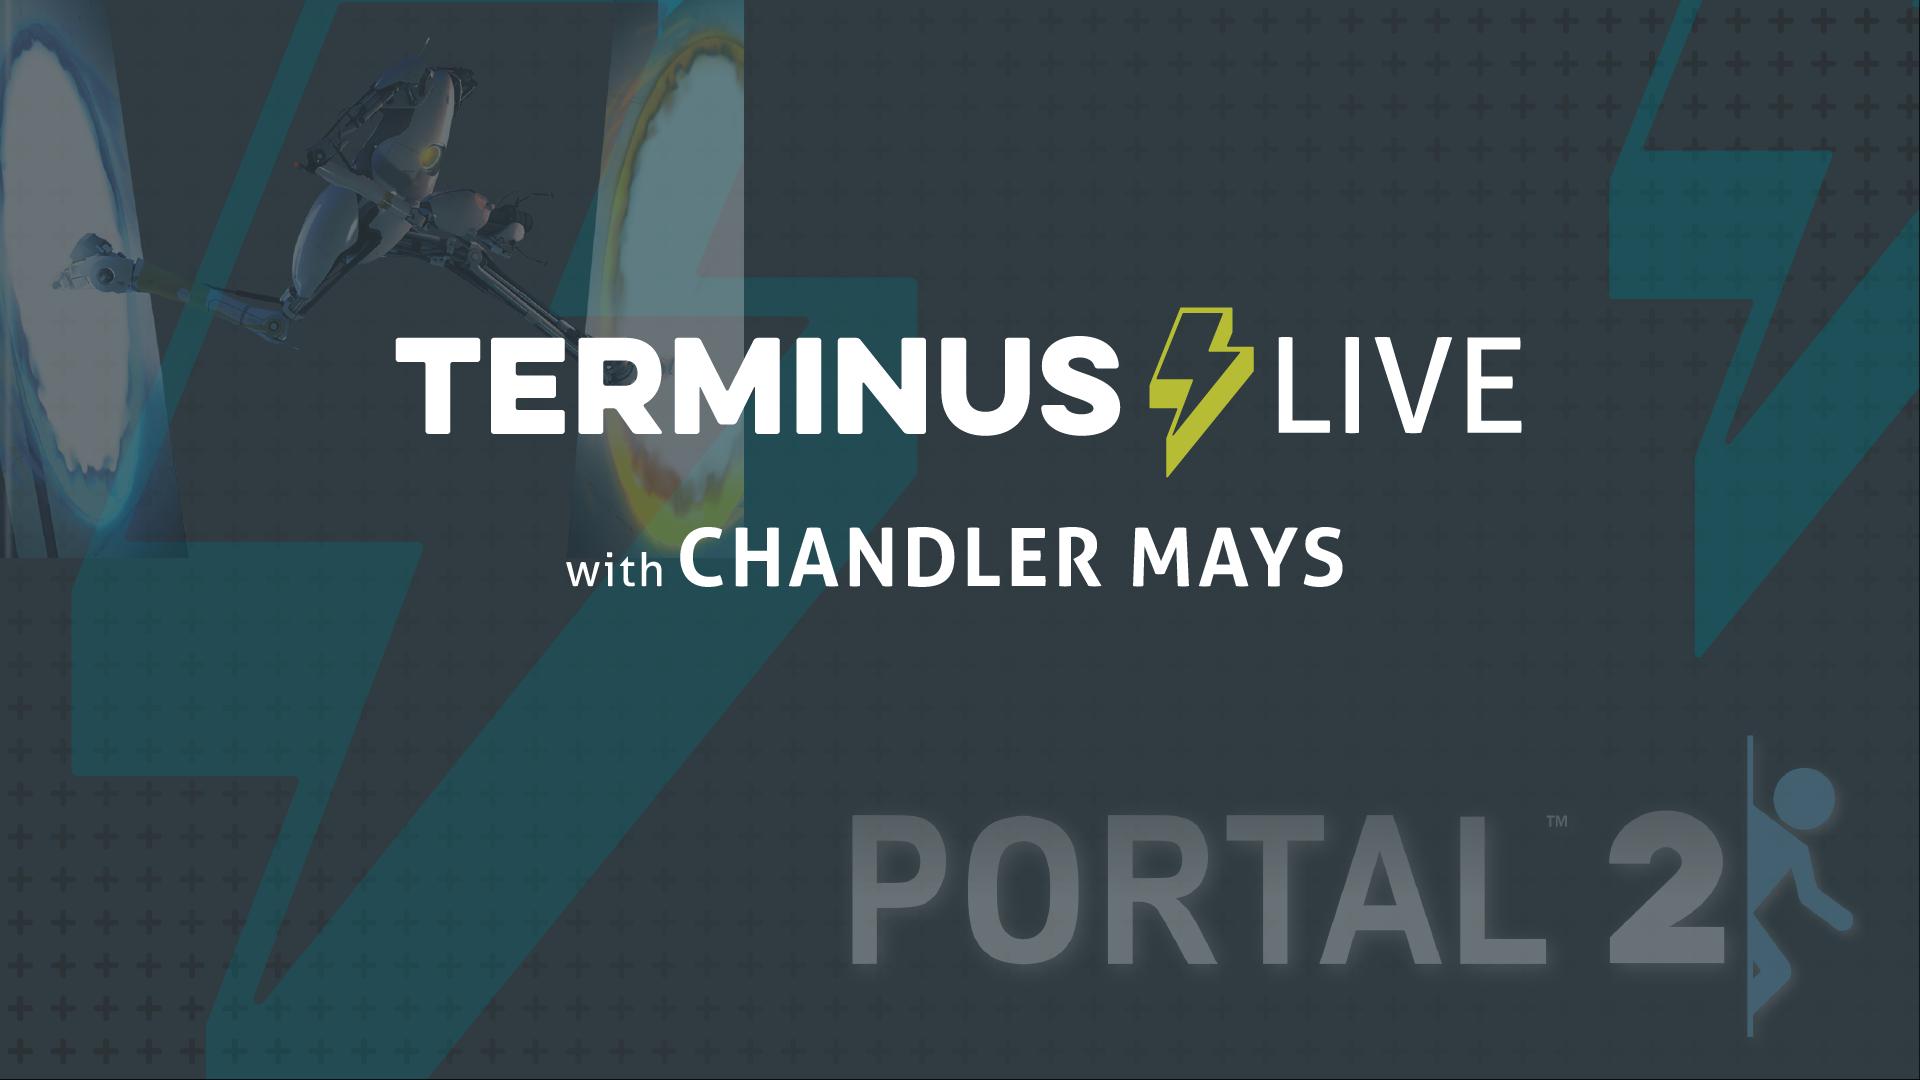 TERMINUS Live: Chandler Mays plays Portal 2